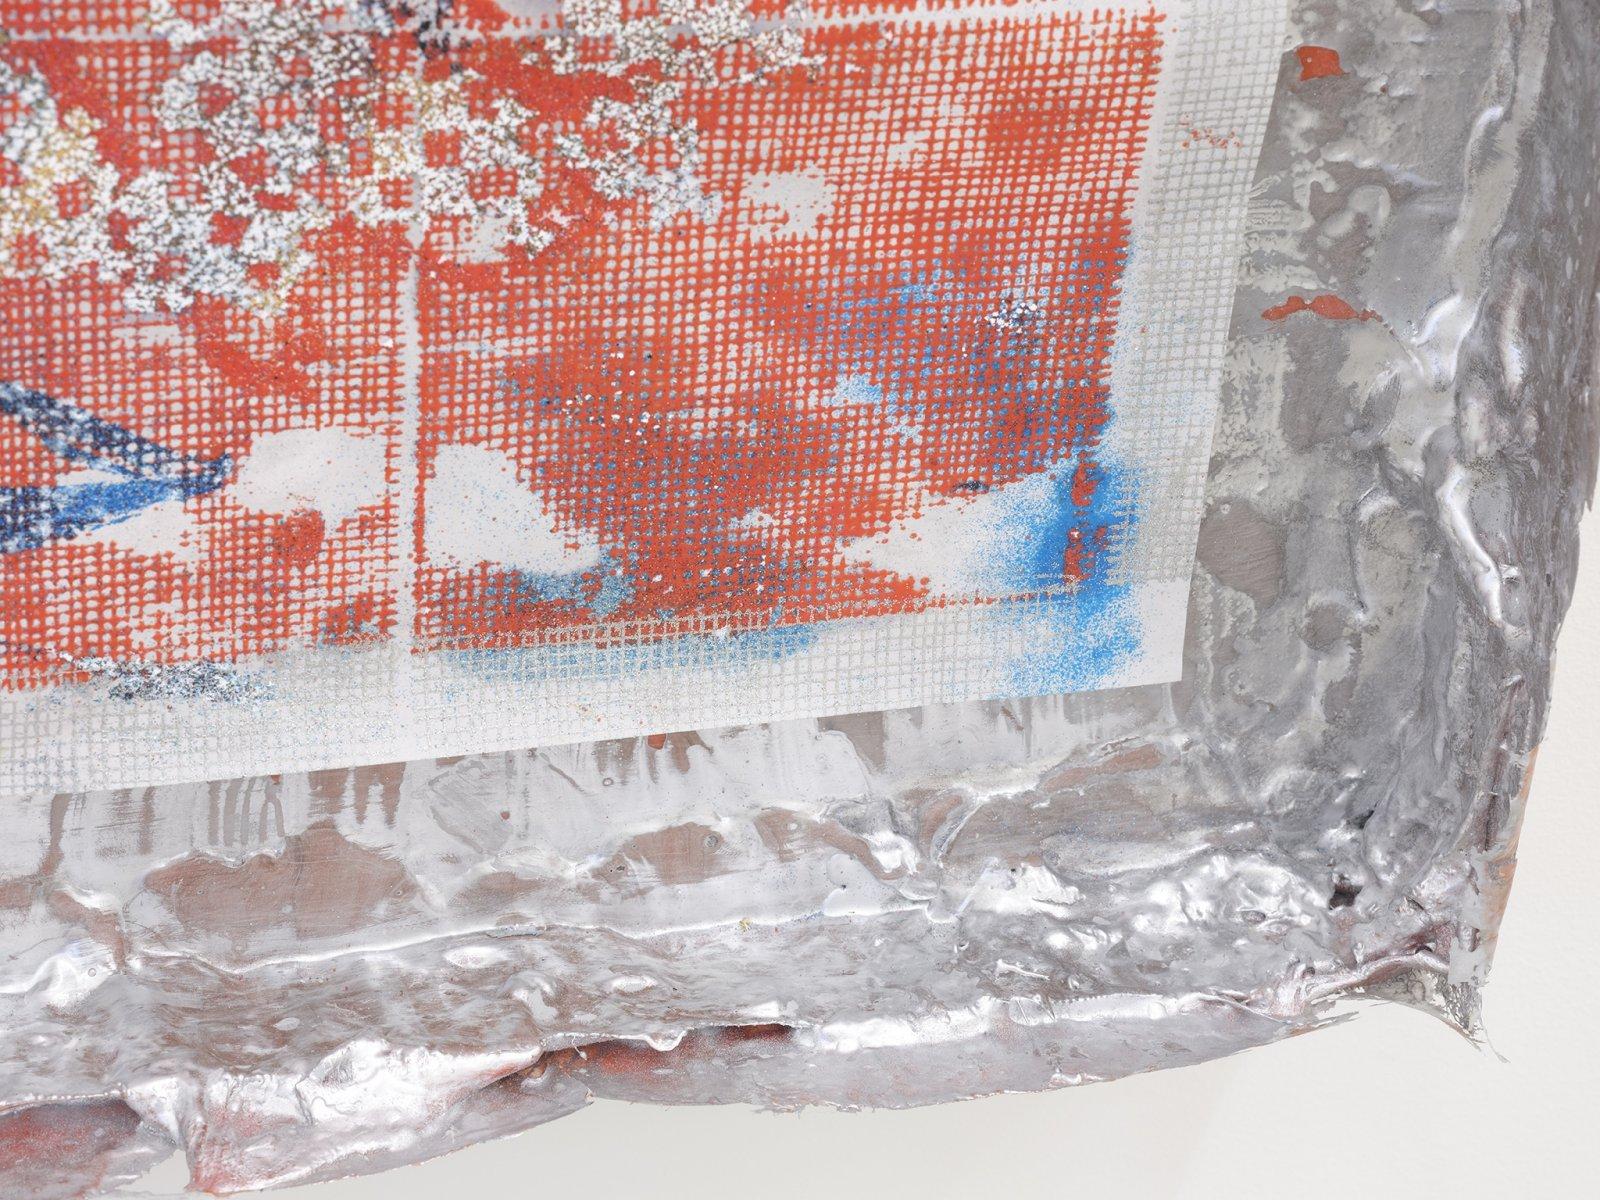 Rebecca Brewer, Live Resin: Salt Burn (detail), 2019, urethane resin, aluminum mesh, pigment, plexiglas, embossing powder on vellum, 41 x 29 in. (104 x 74 cm)